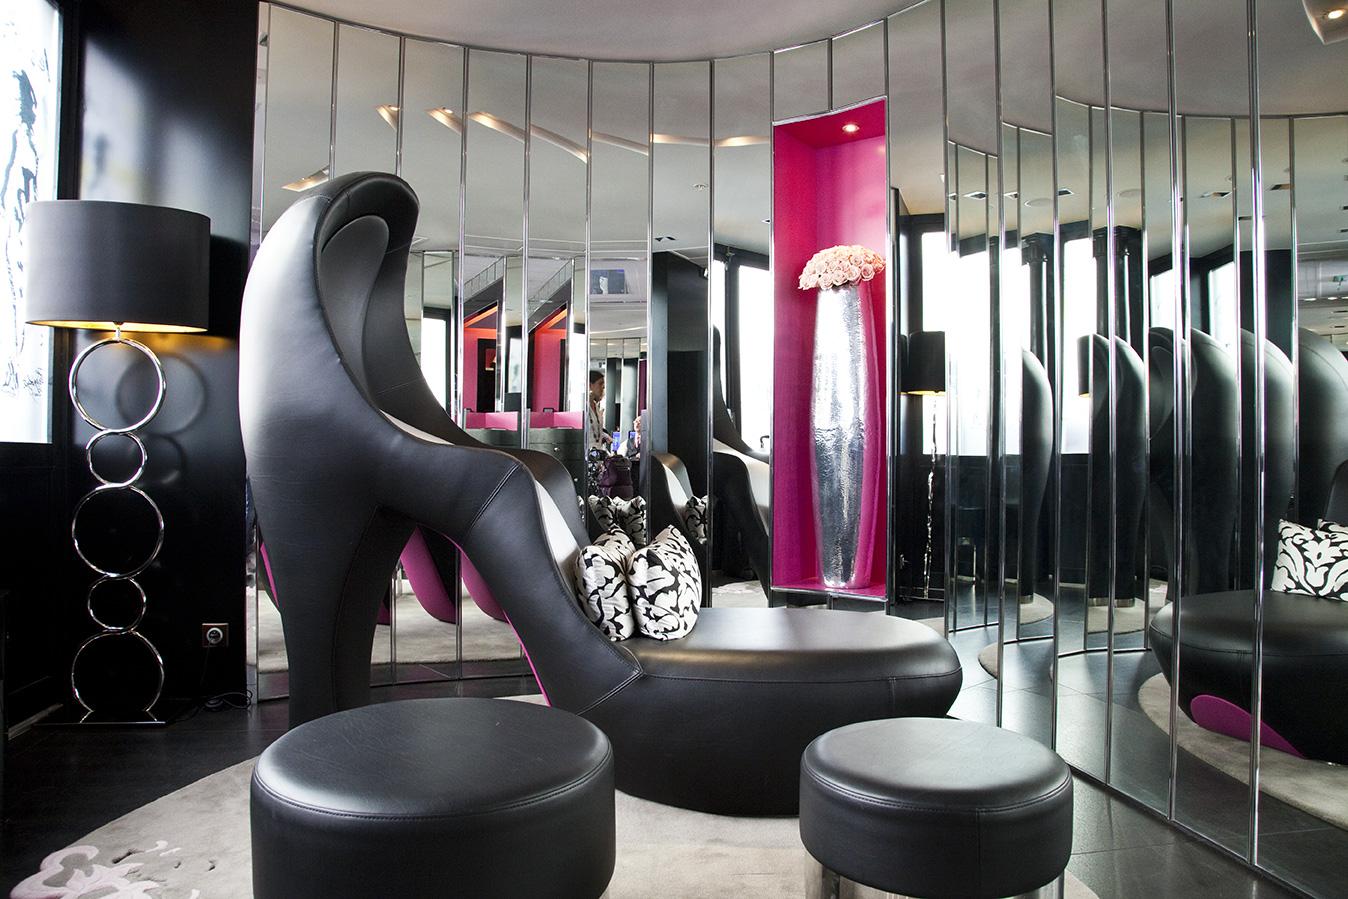 Par s delicatessen carla de la serna carla de la serna for Les jardins de la villa paris hotel